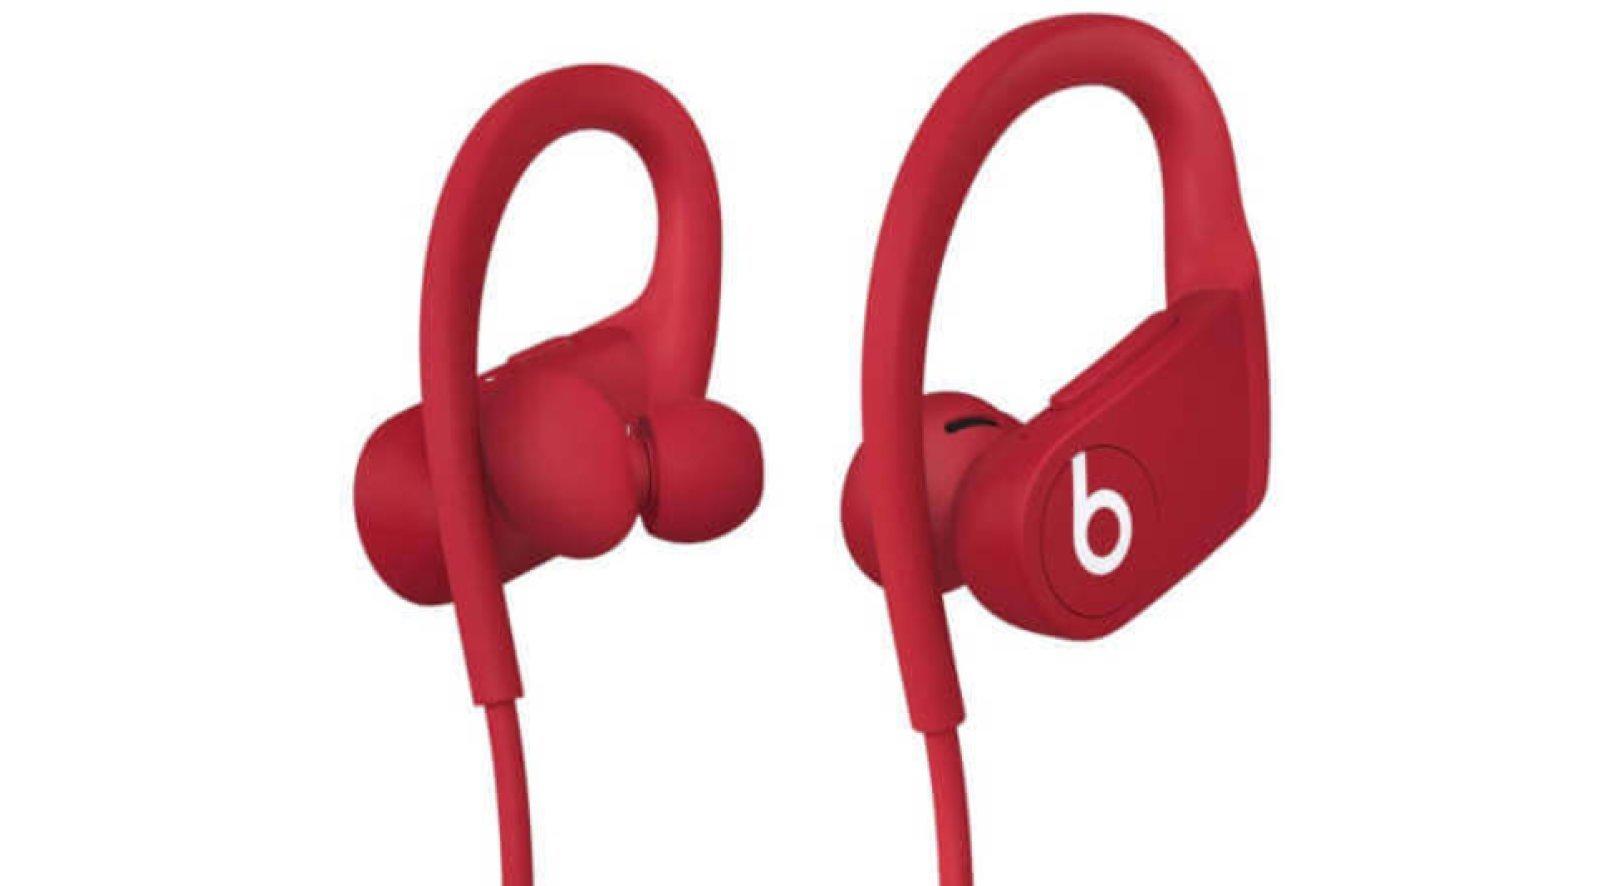 رسمياً شركة آبل تطلق سماعات Powerbeats 4 بسعر 149 دولار